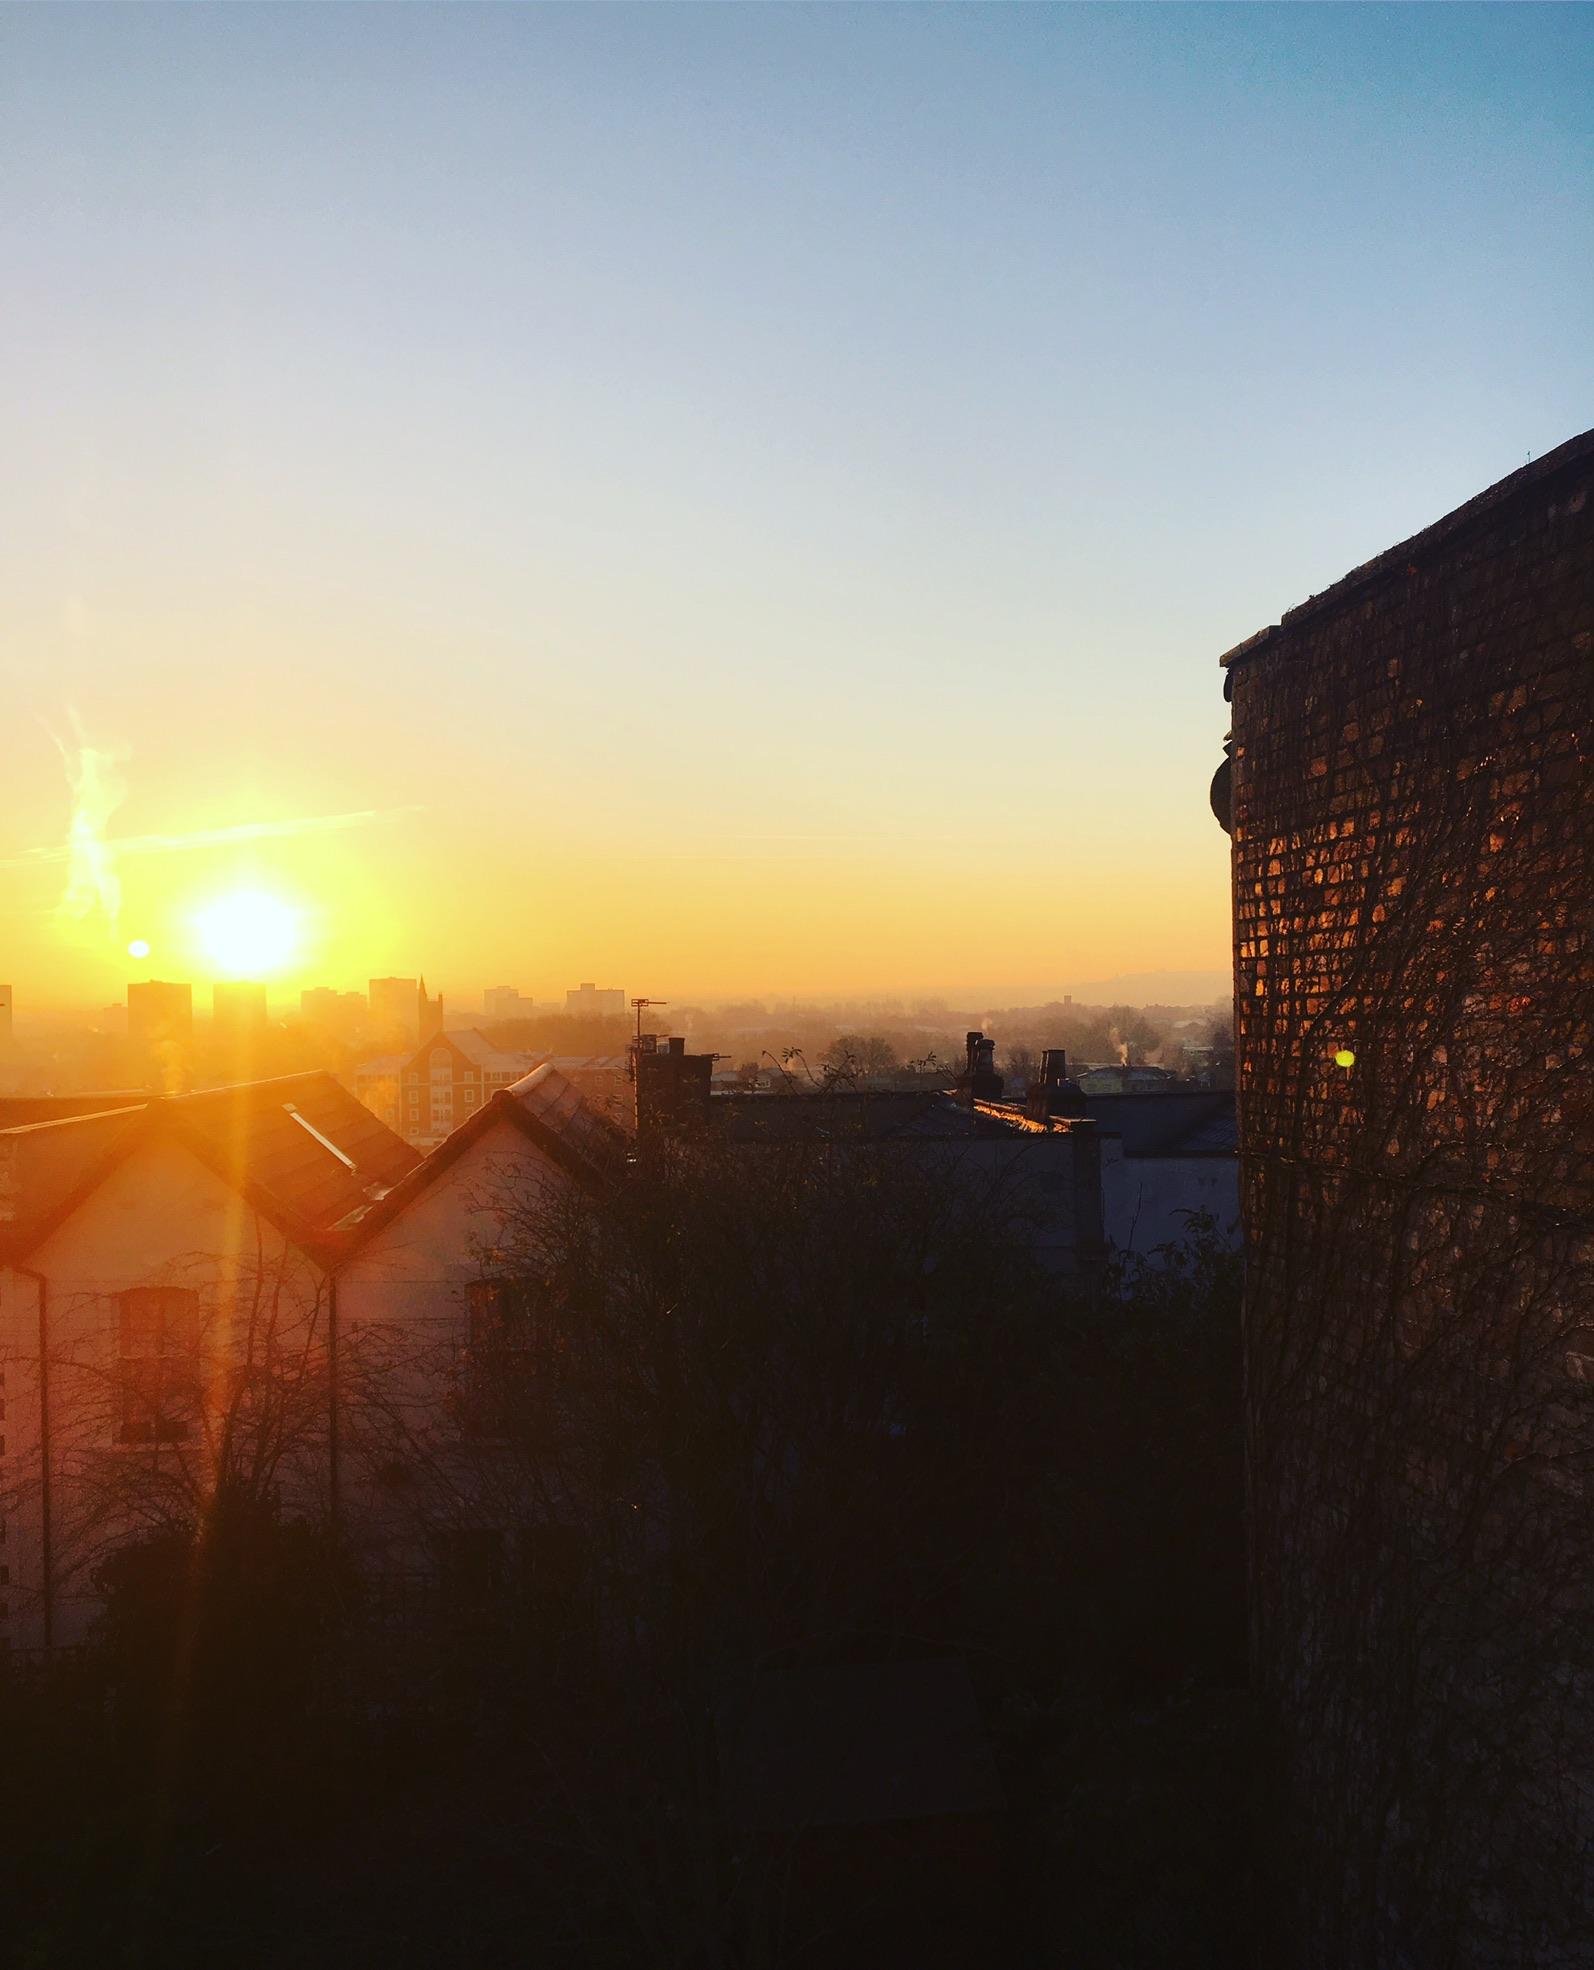 Bristol morning sunshine from my bedroom window